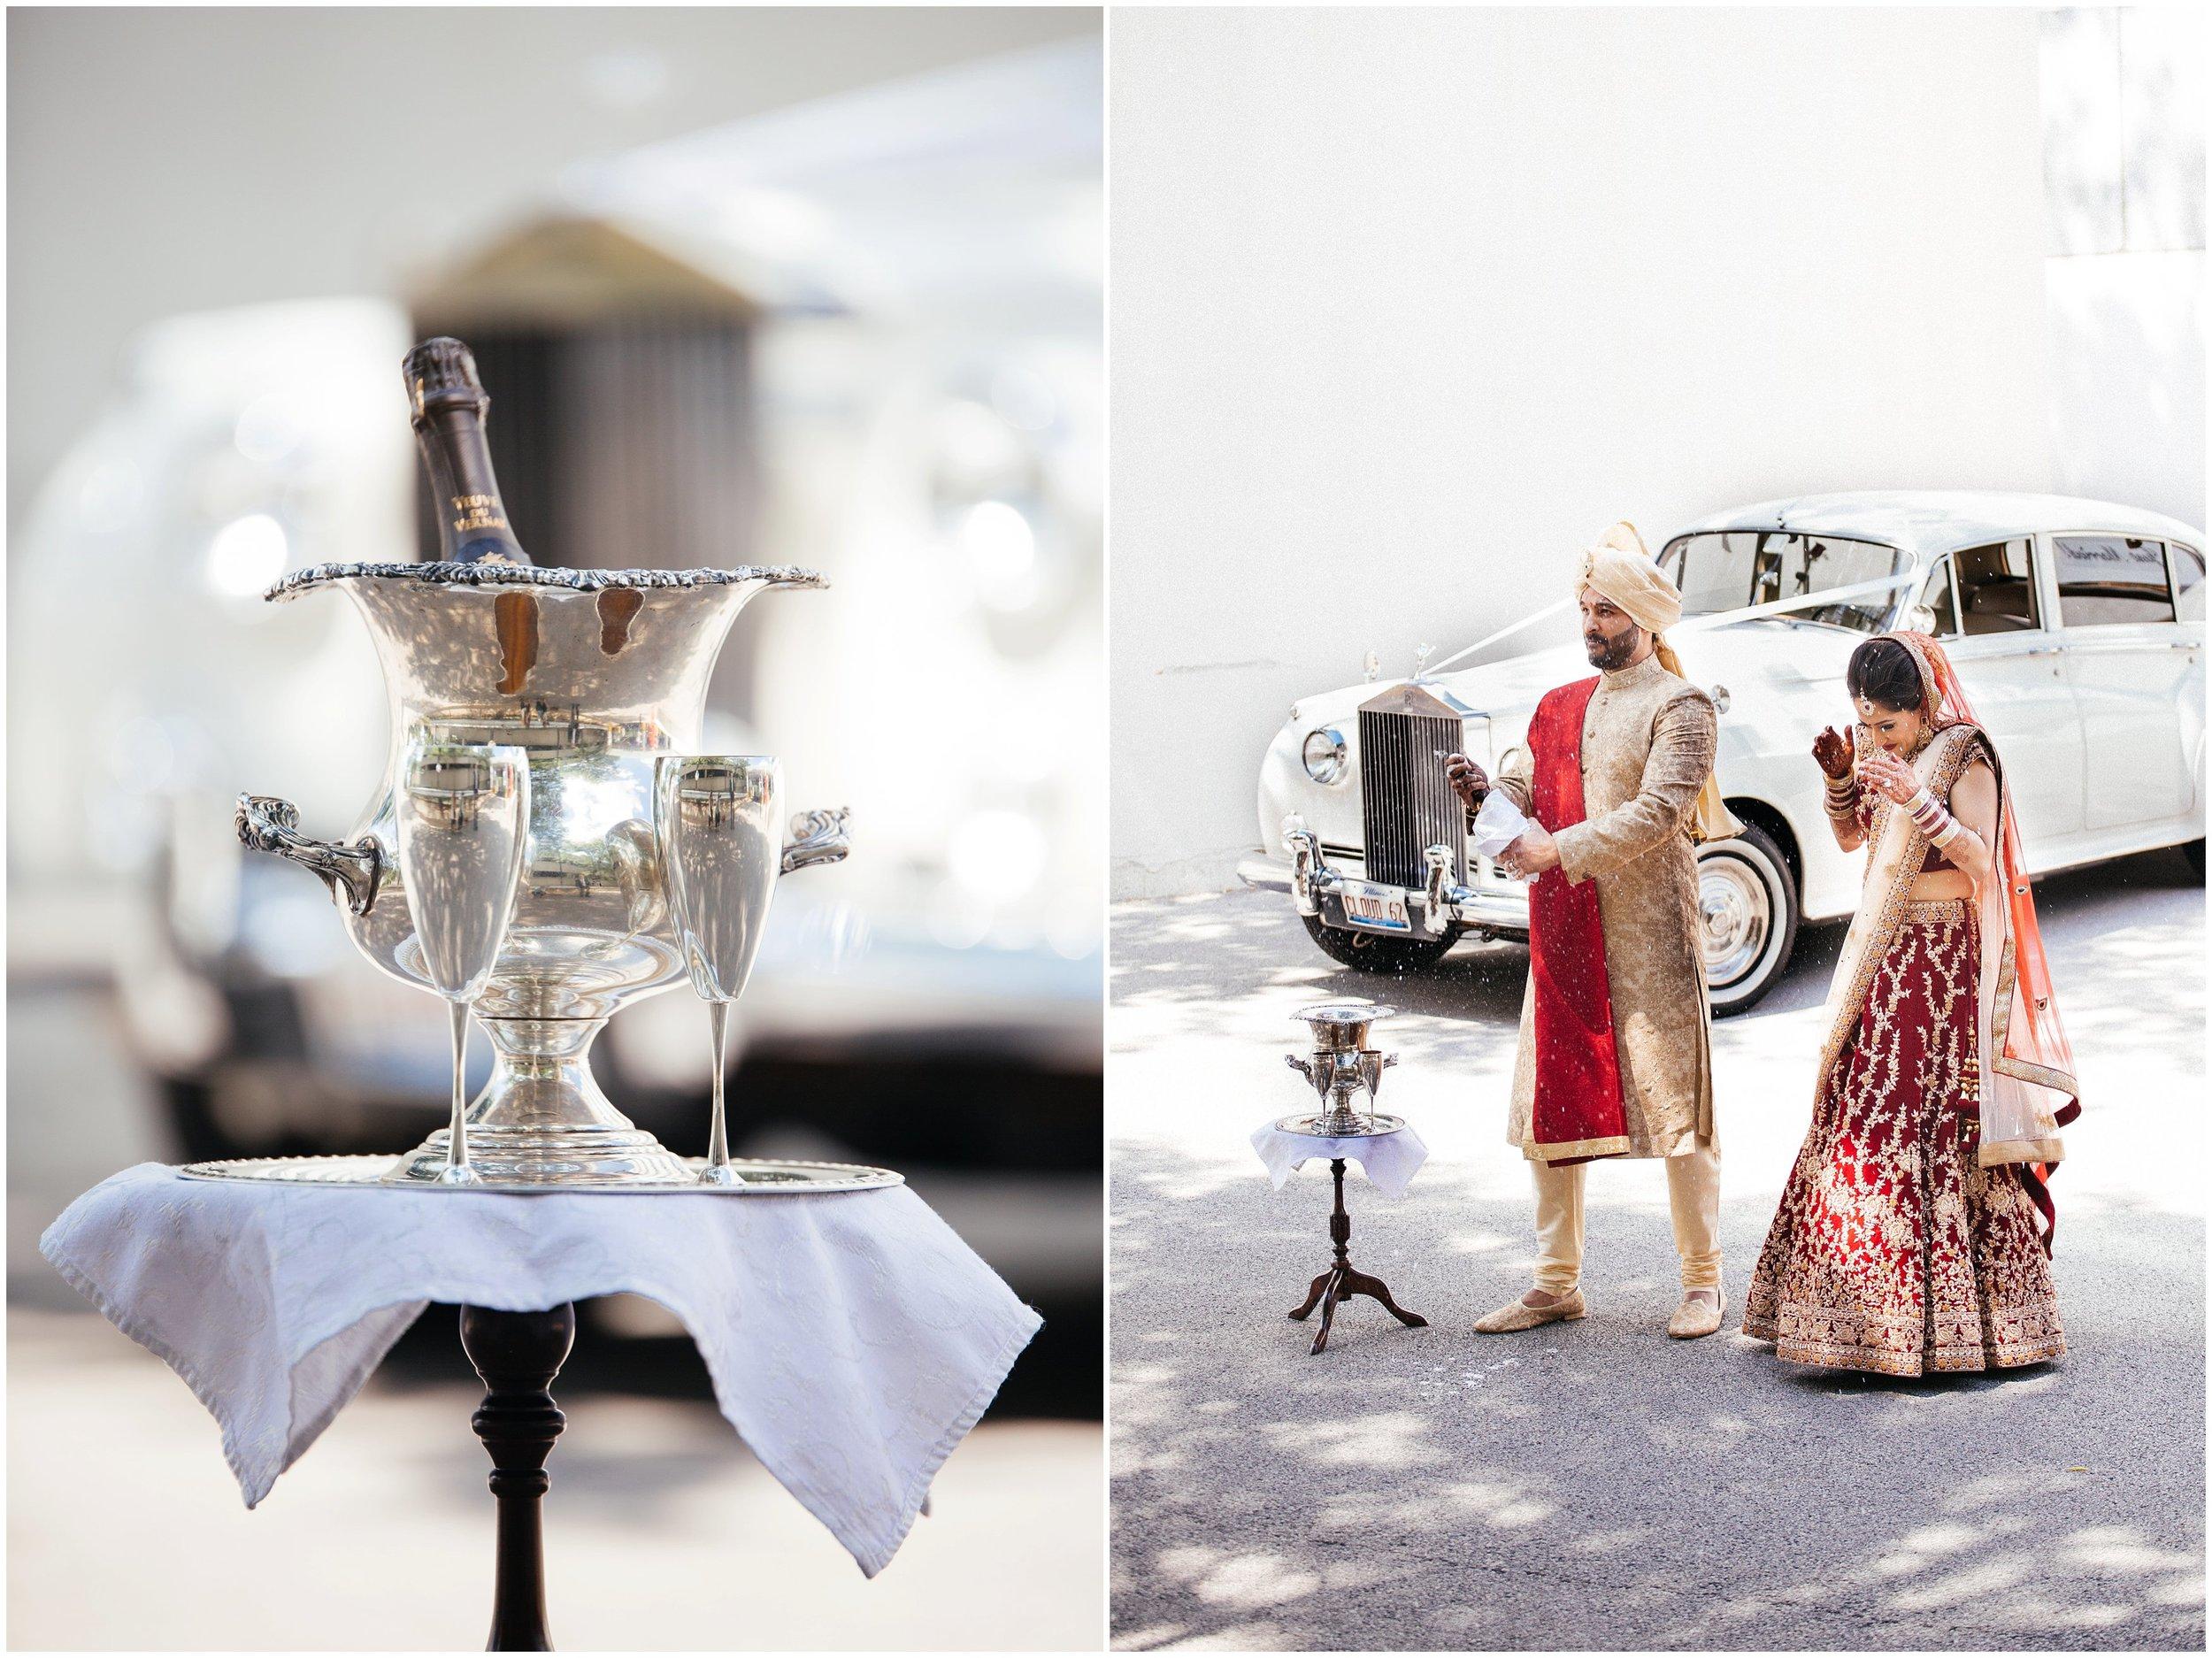 Le Cape Weddings - South Asian Wedding in Illinois - Tanvi and Anshul -0818_LuxuryDestinationPhotographer.jpg